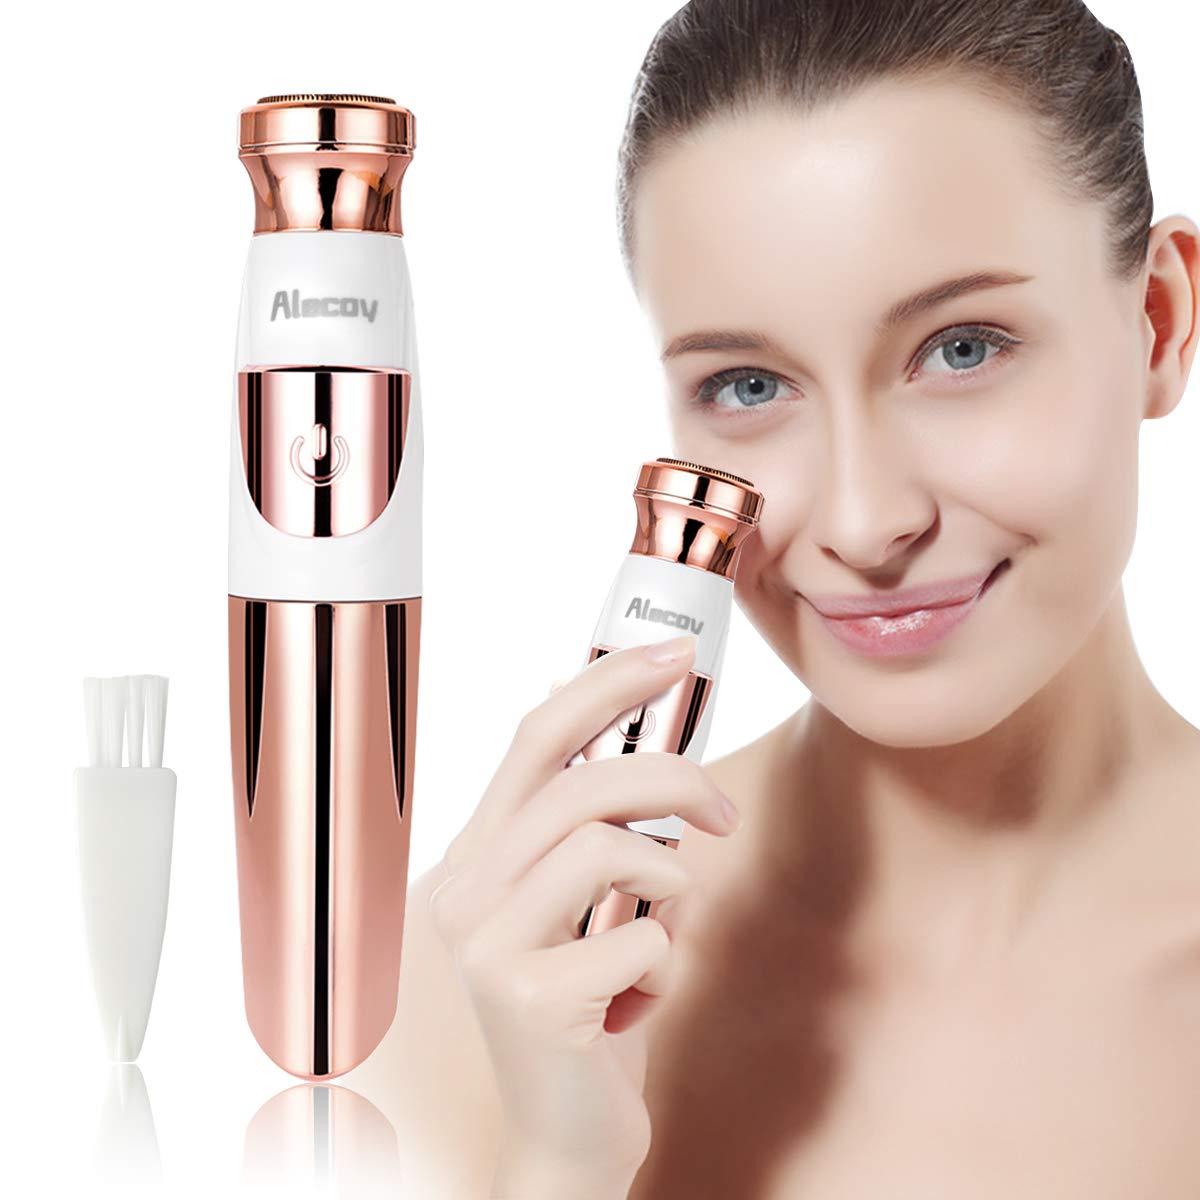 Lilizhou Women's Facial Hair Remover for Face Lip Armpit Chin Cheek Arm Leg and Full Body, Electric Facial Hair Removal For Women with Clean Brush